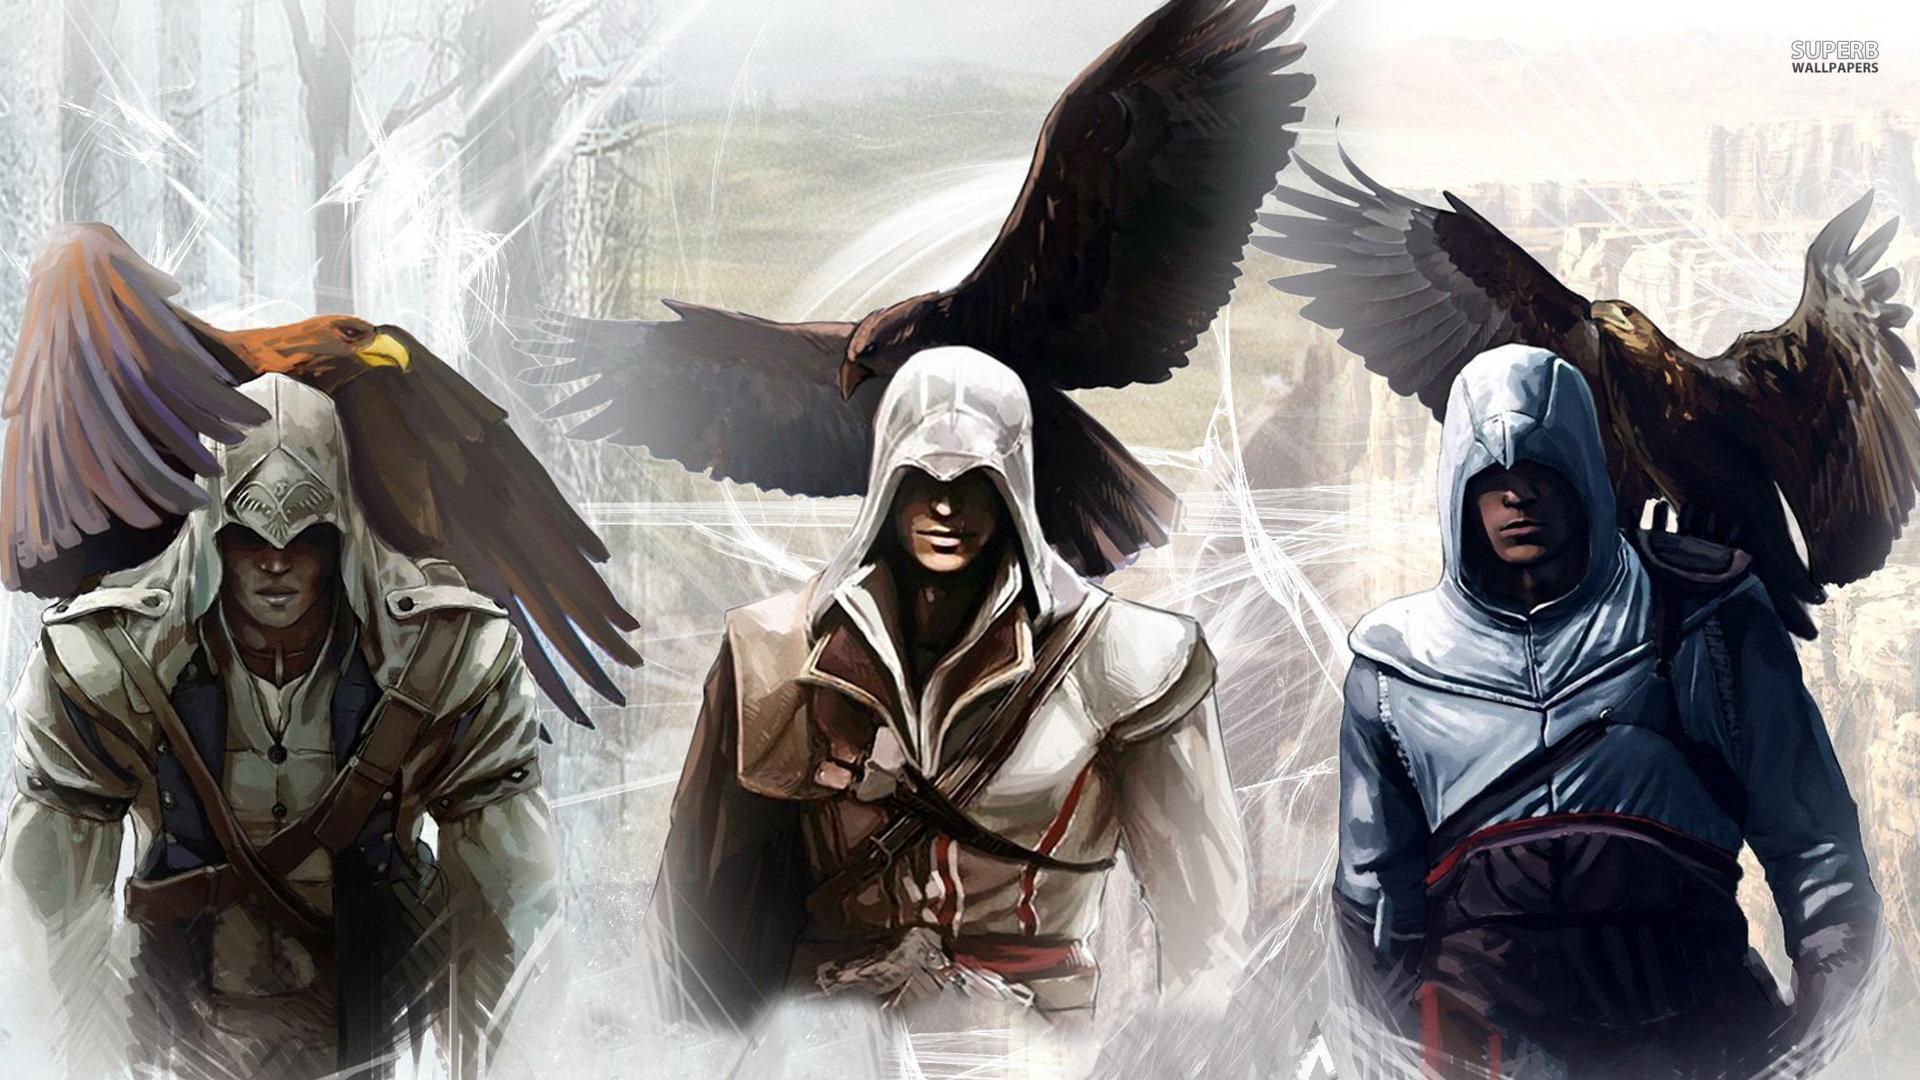 Assassins Creed Brotherhood Wallpaper 40699 Hd Wallpapers Background 1920x1080